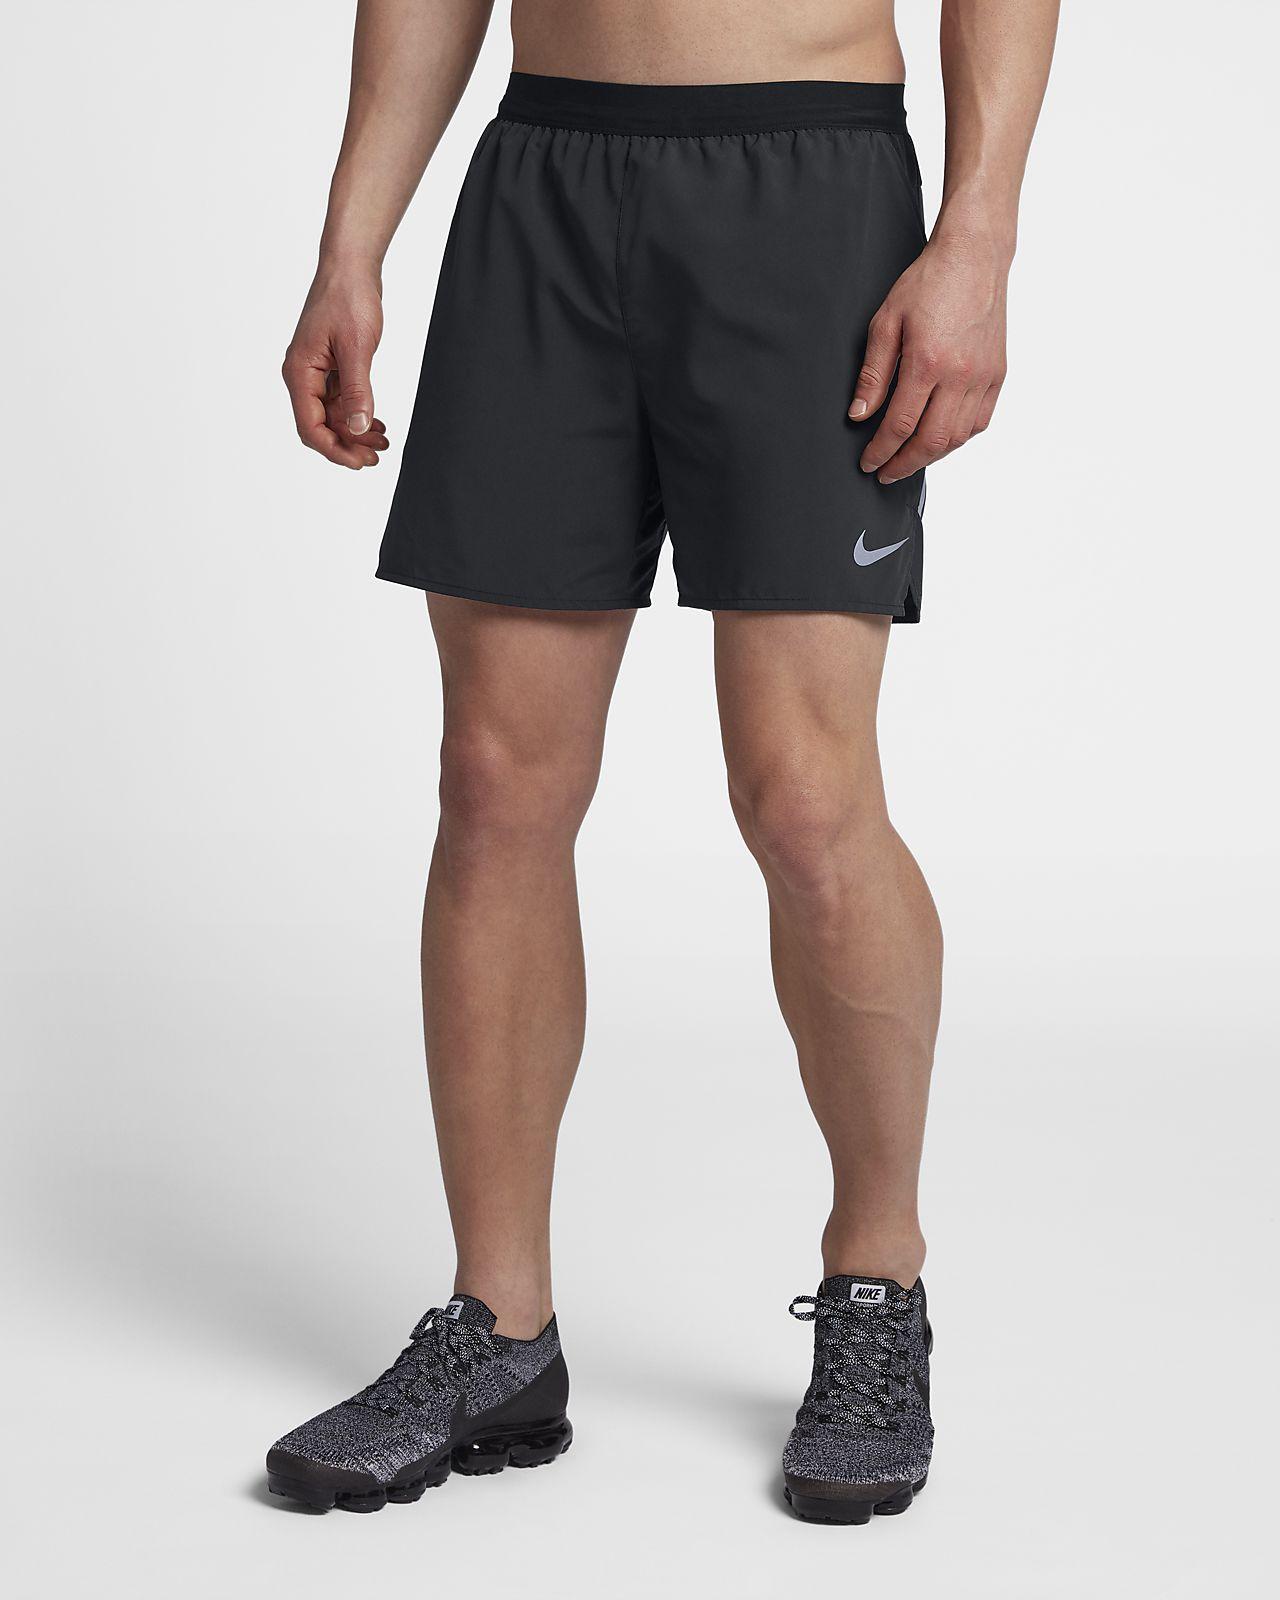 47c842103b361 Lined Running Shorts Nike Flex Stride Men s 5